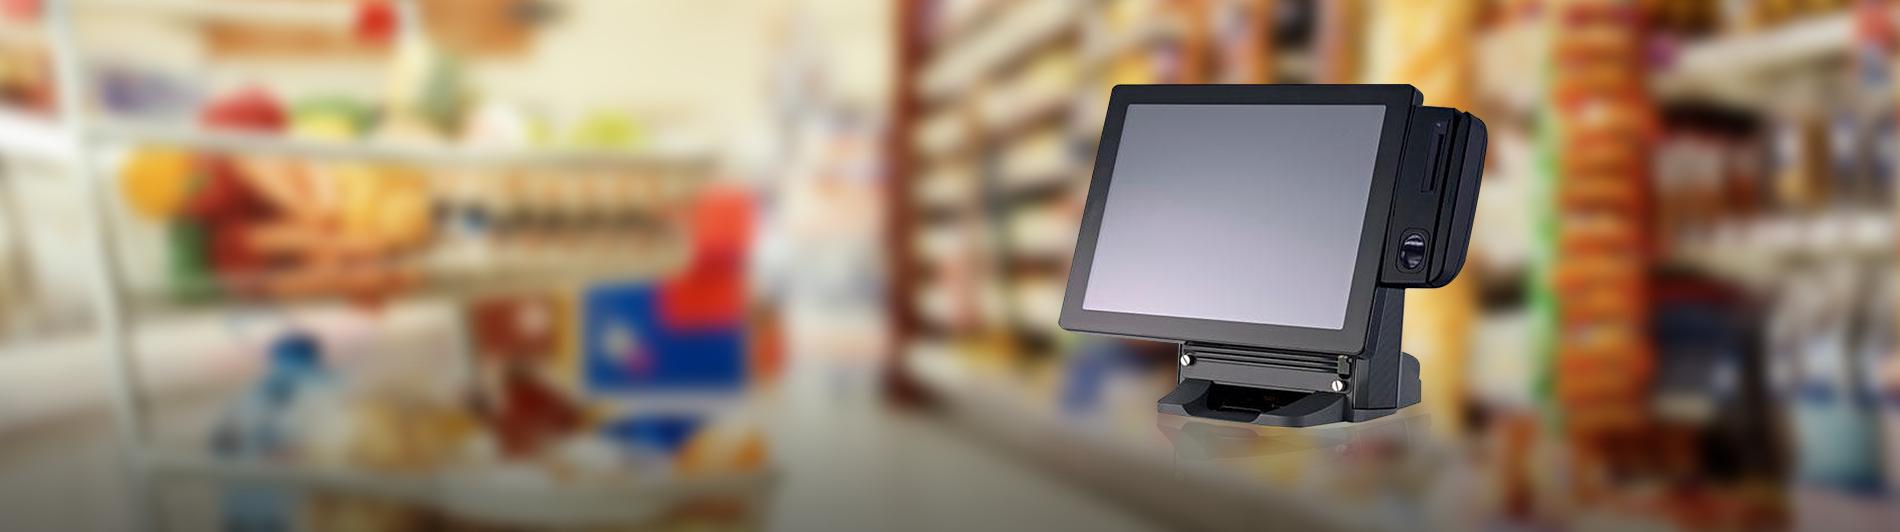 Unipro Slider-Show Retail POS - 1